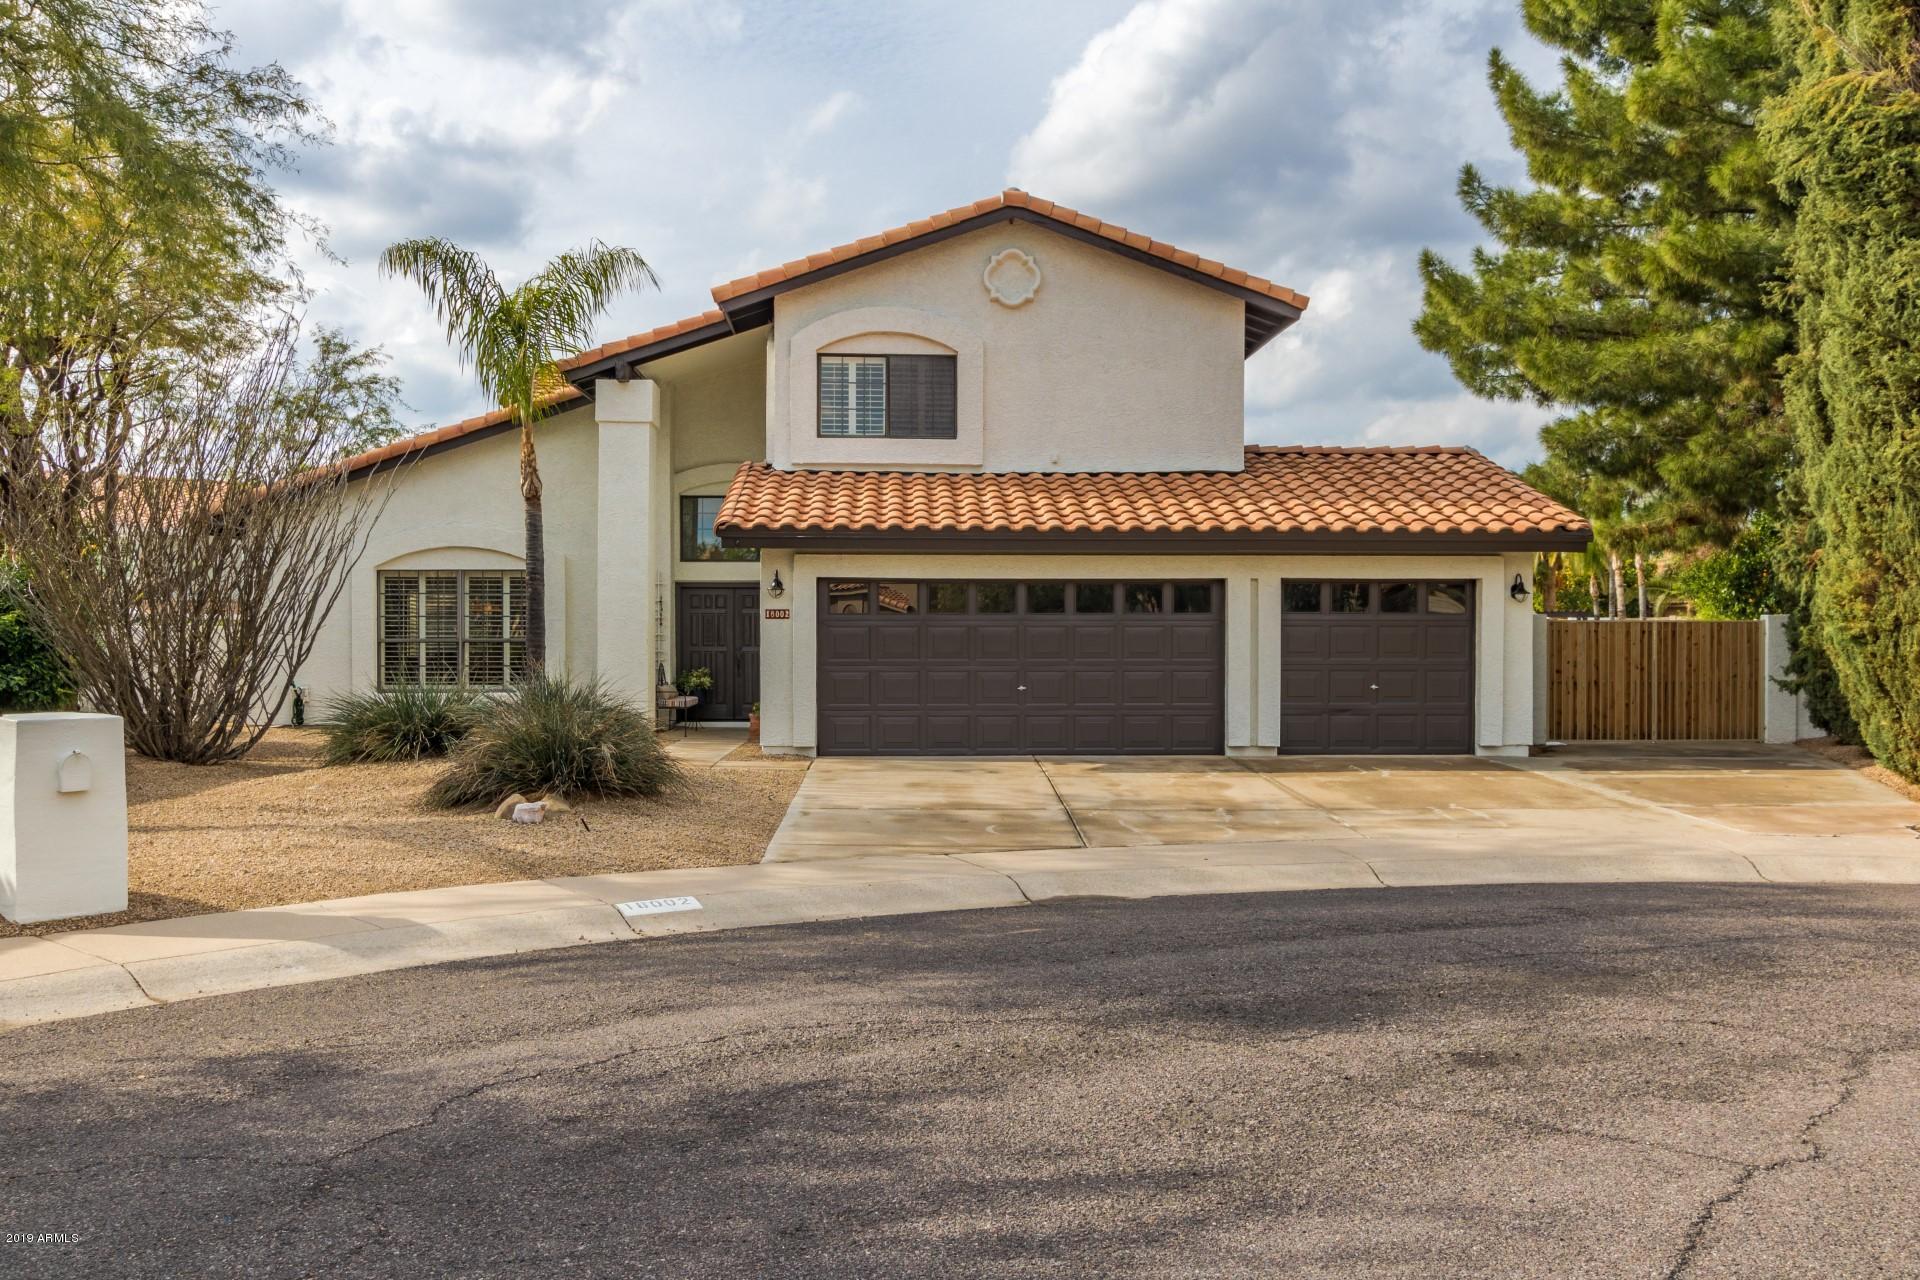 18002 N 54TH Street, Scottsdale AZ 85254